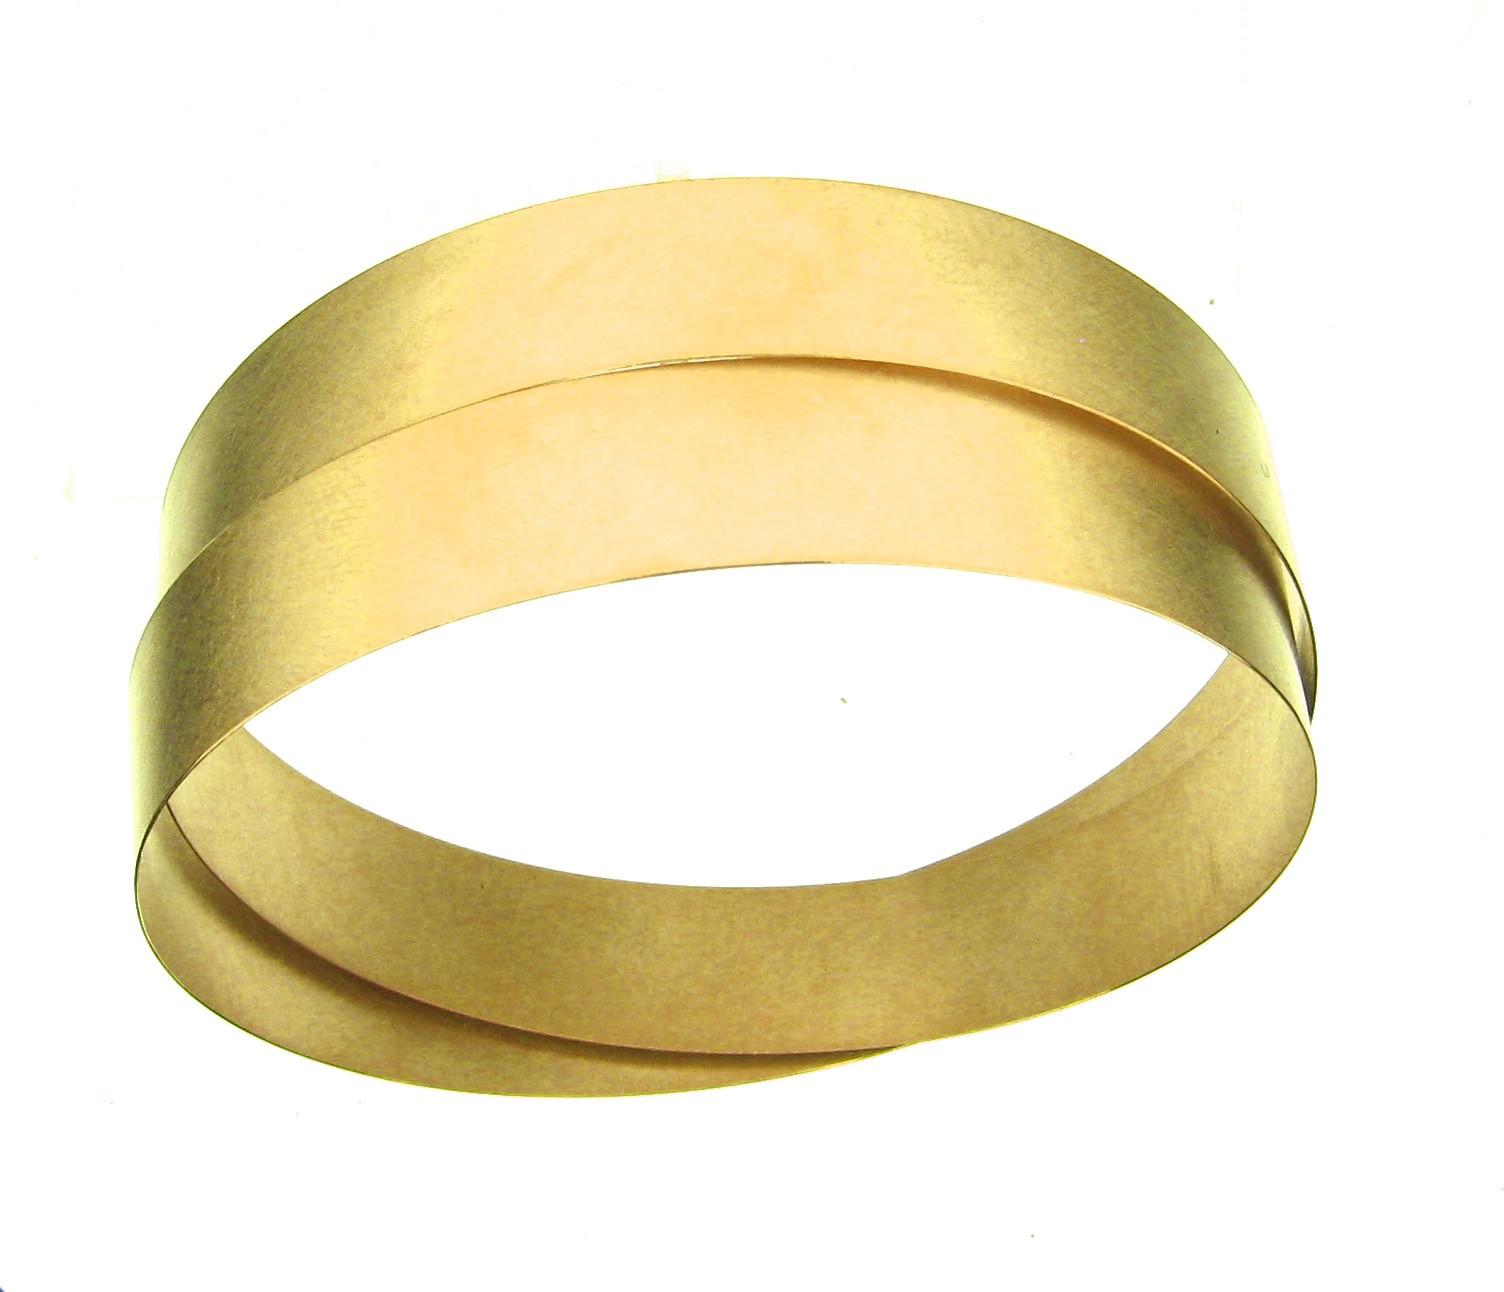 Armreif Bow 12mm Gold - Niessing - N212002